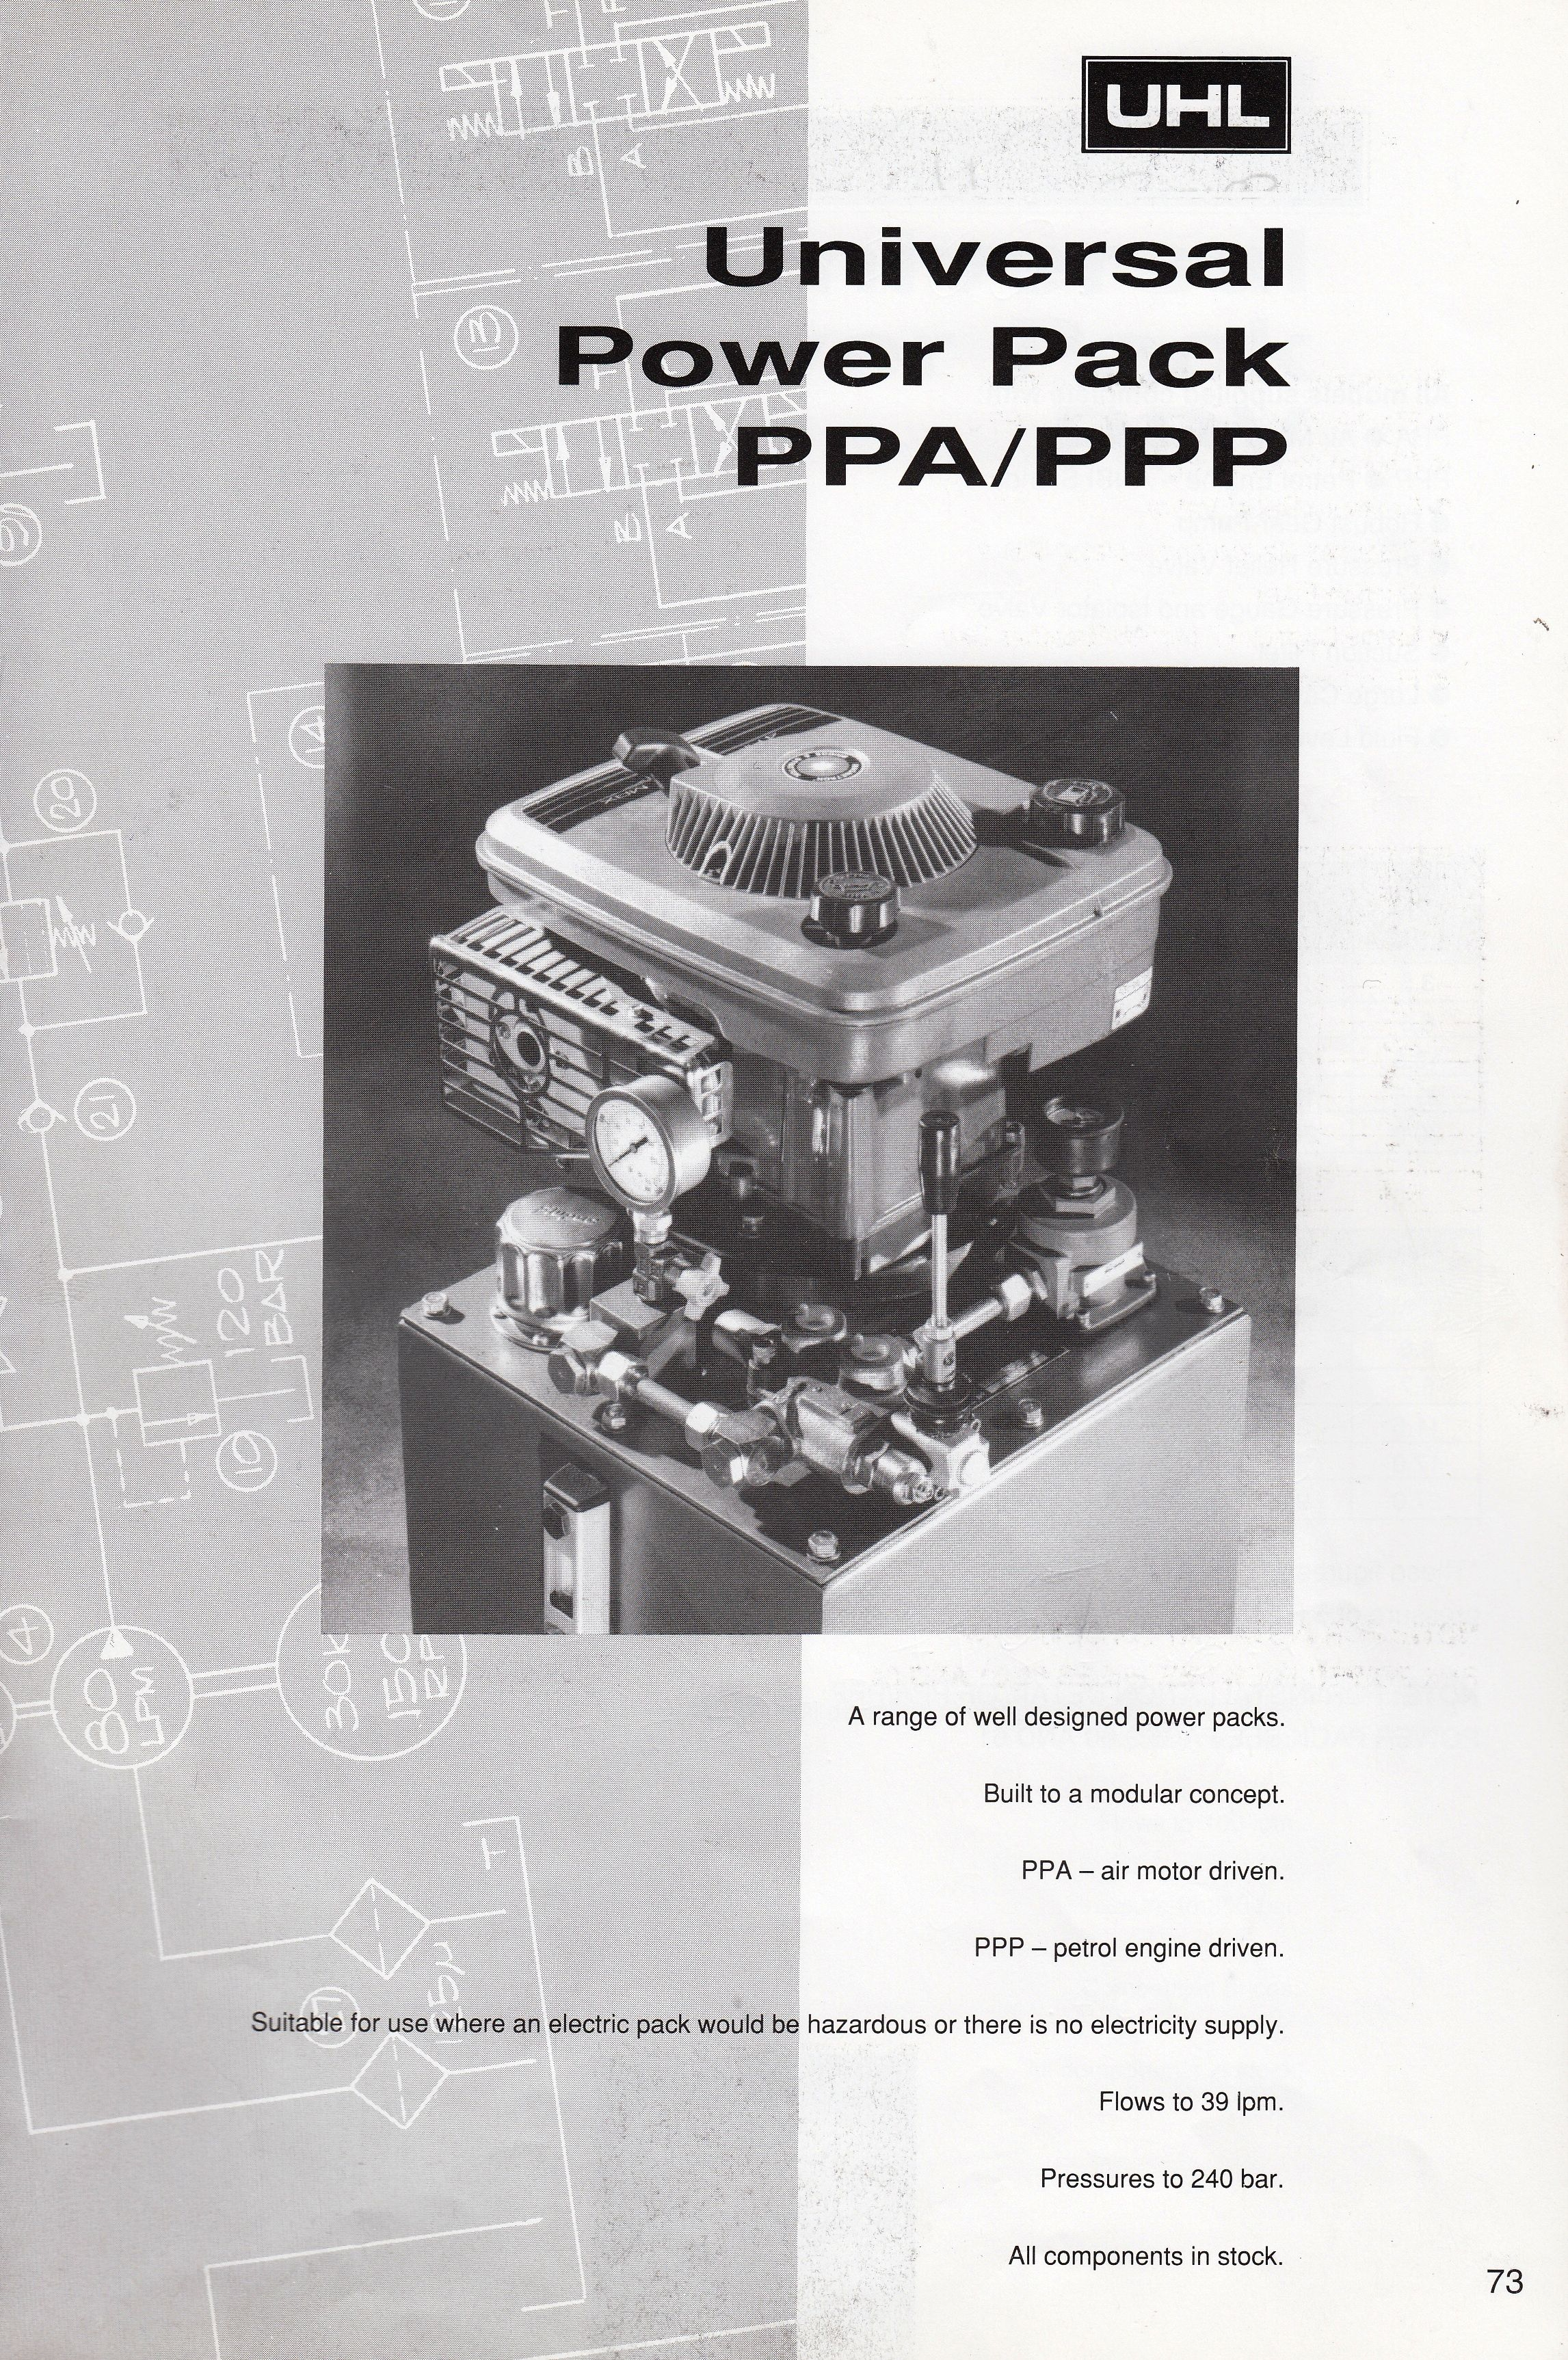 Petrol engine and air motor driven HydraulicPowerPacks